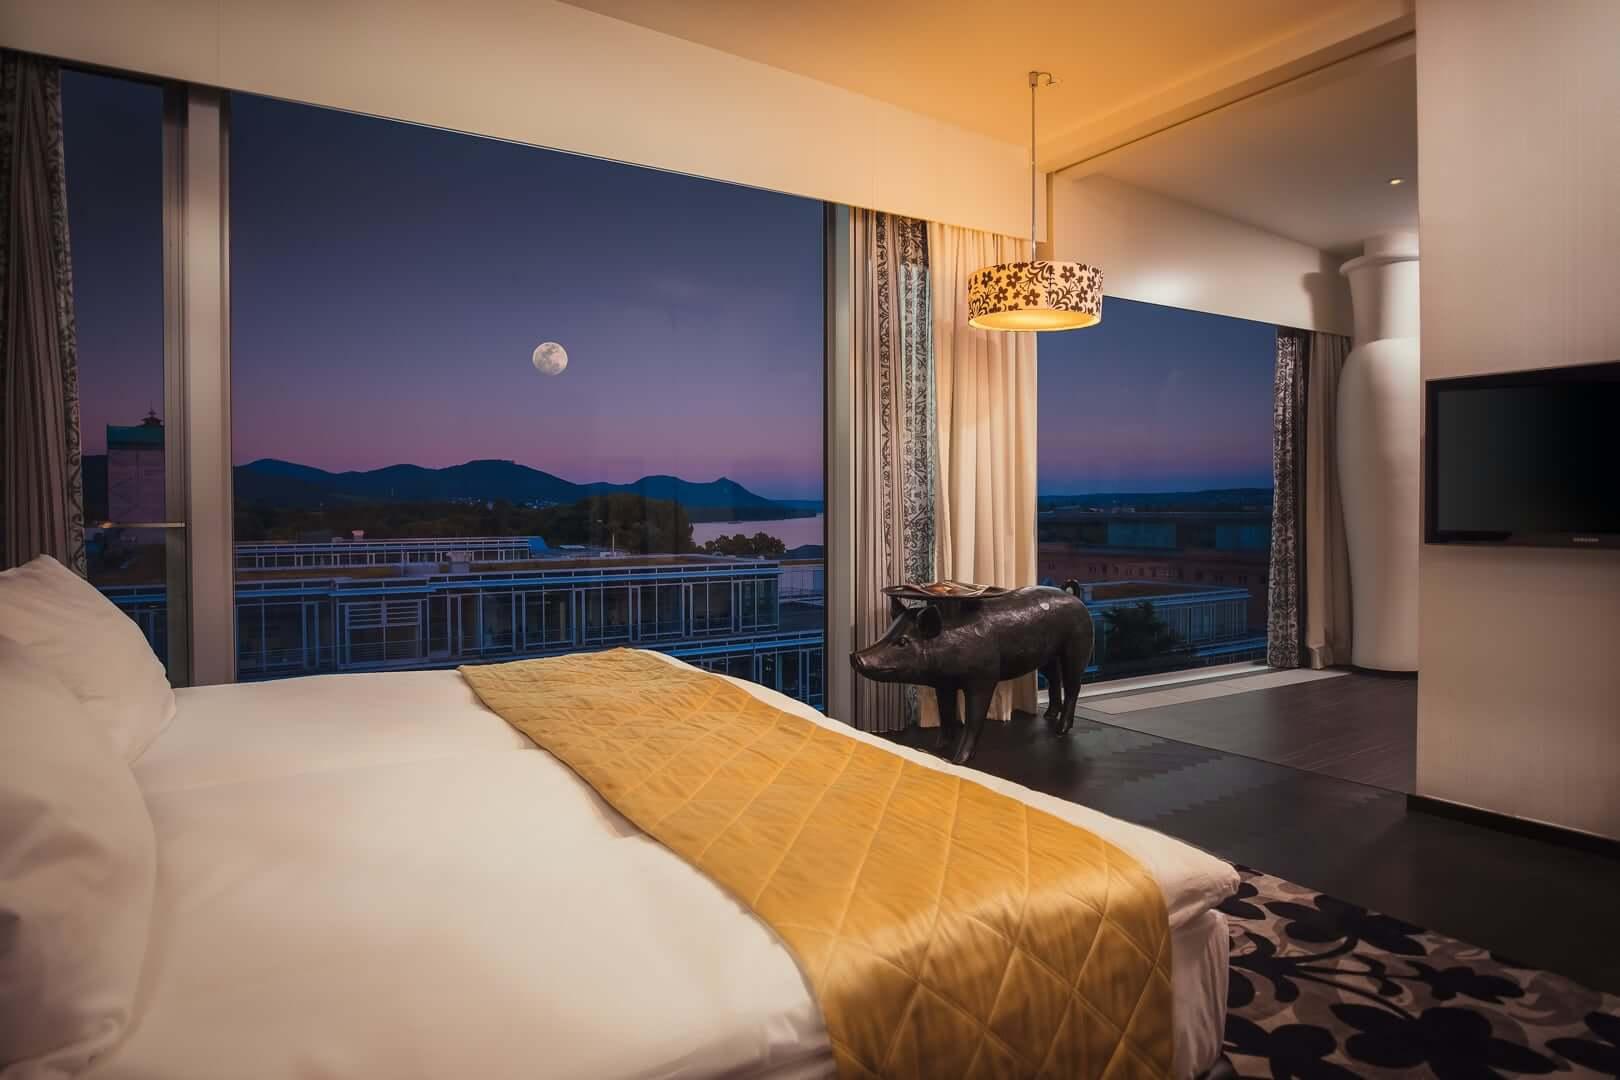 hotel in bonn am rhein kameha grand bonn. Black Bedroom Furniture Sets. Home Design Ideas